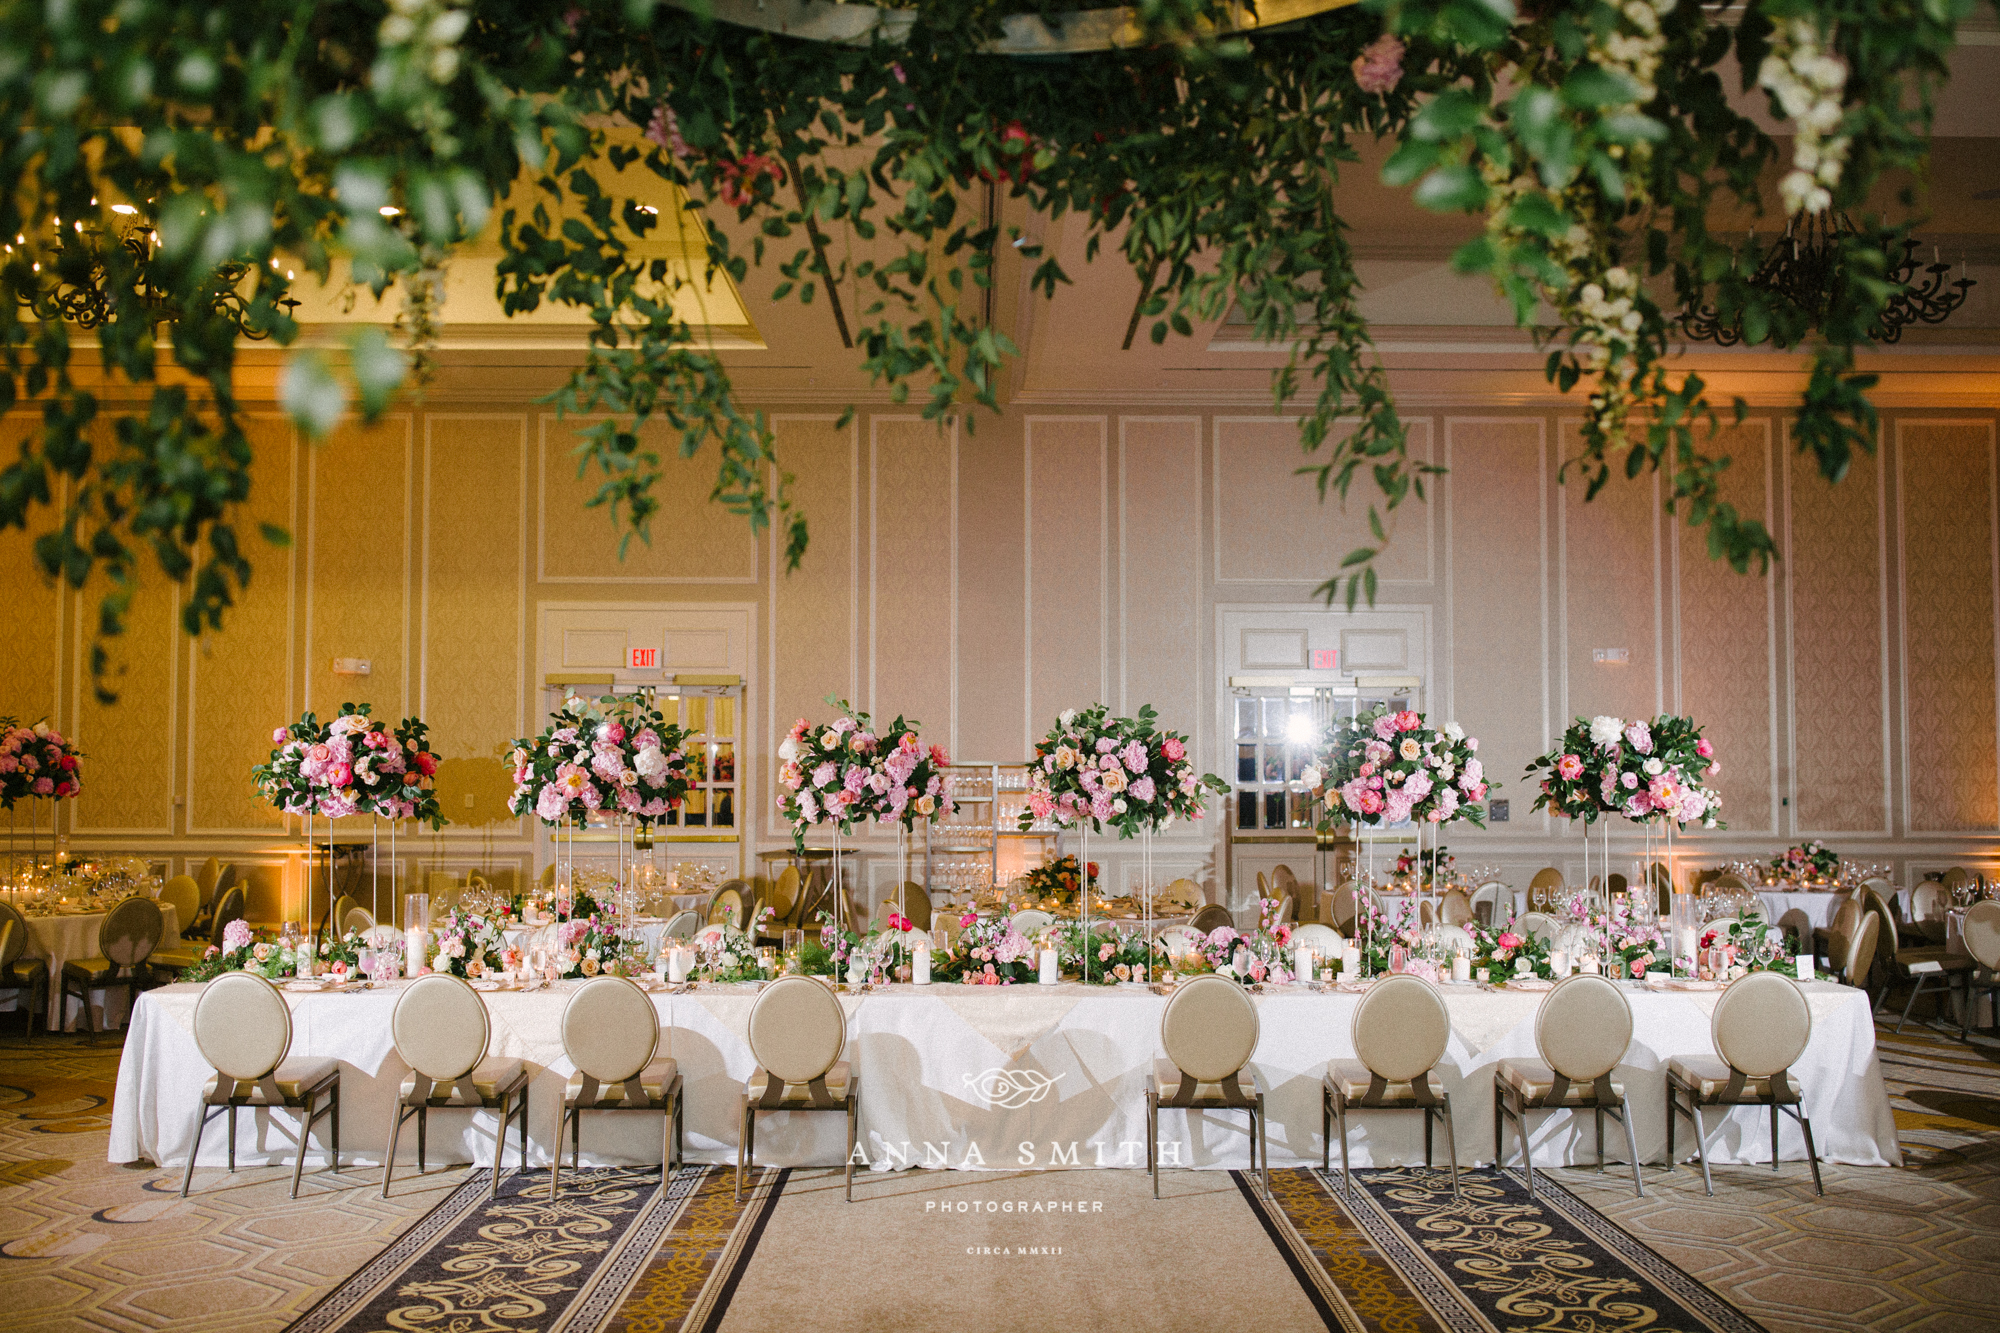 web 17- 4-W-CD-heather brandon wedding perkins adolphus-935.jpg